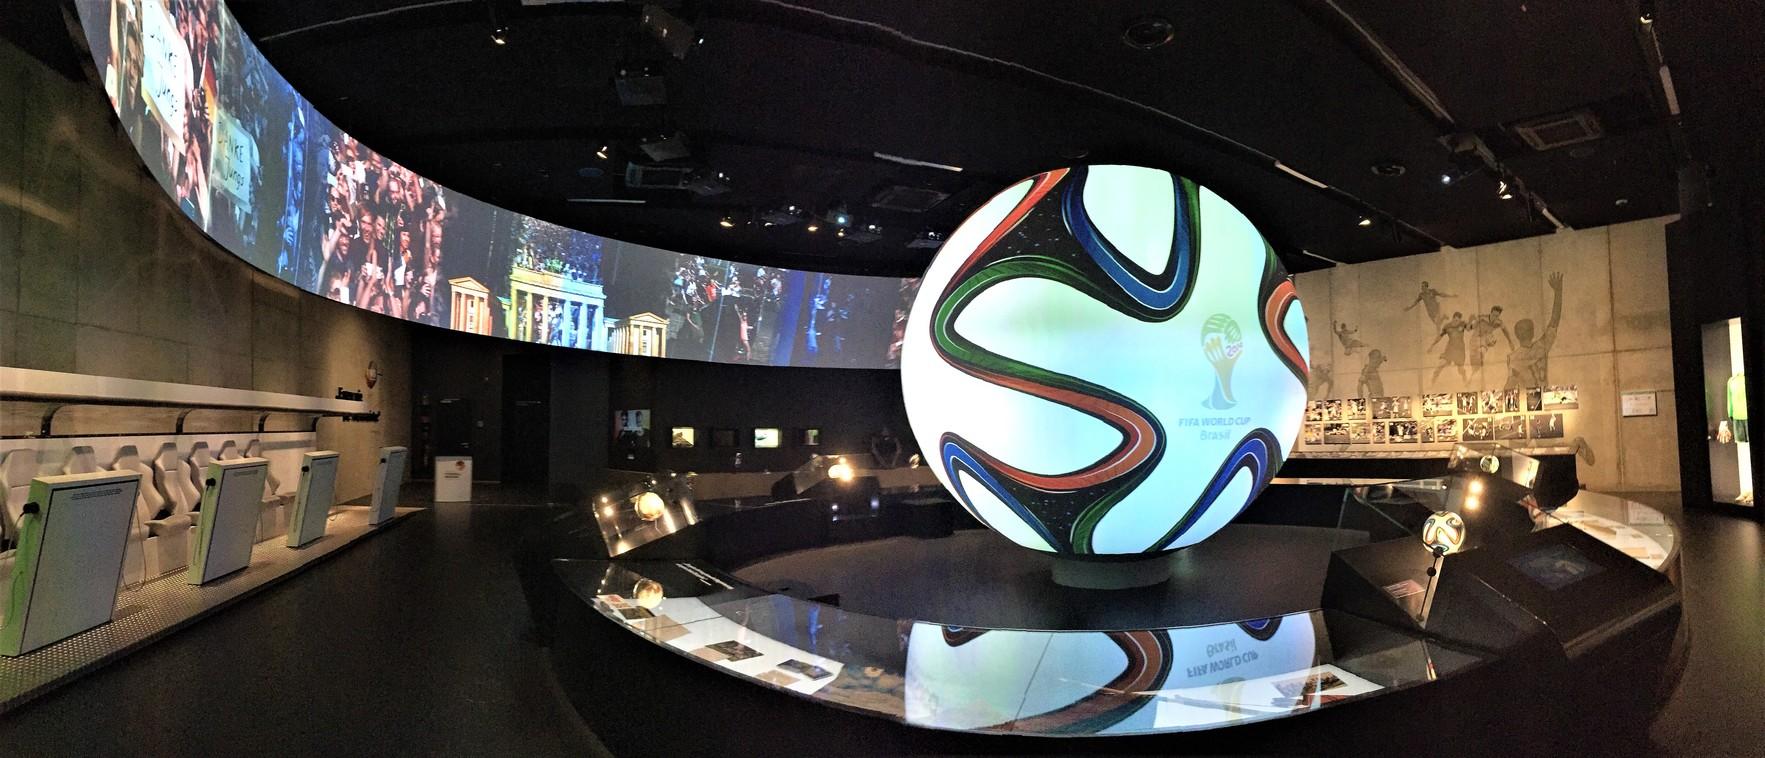 Fußballmuseum Dortmund Preise